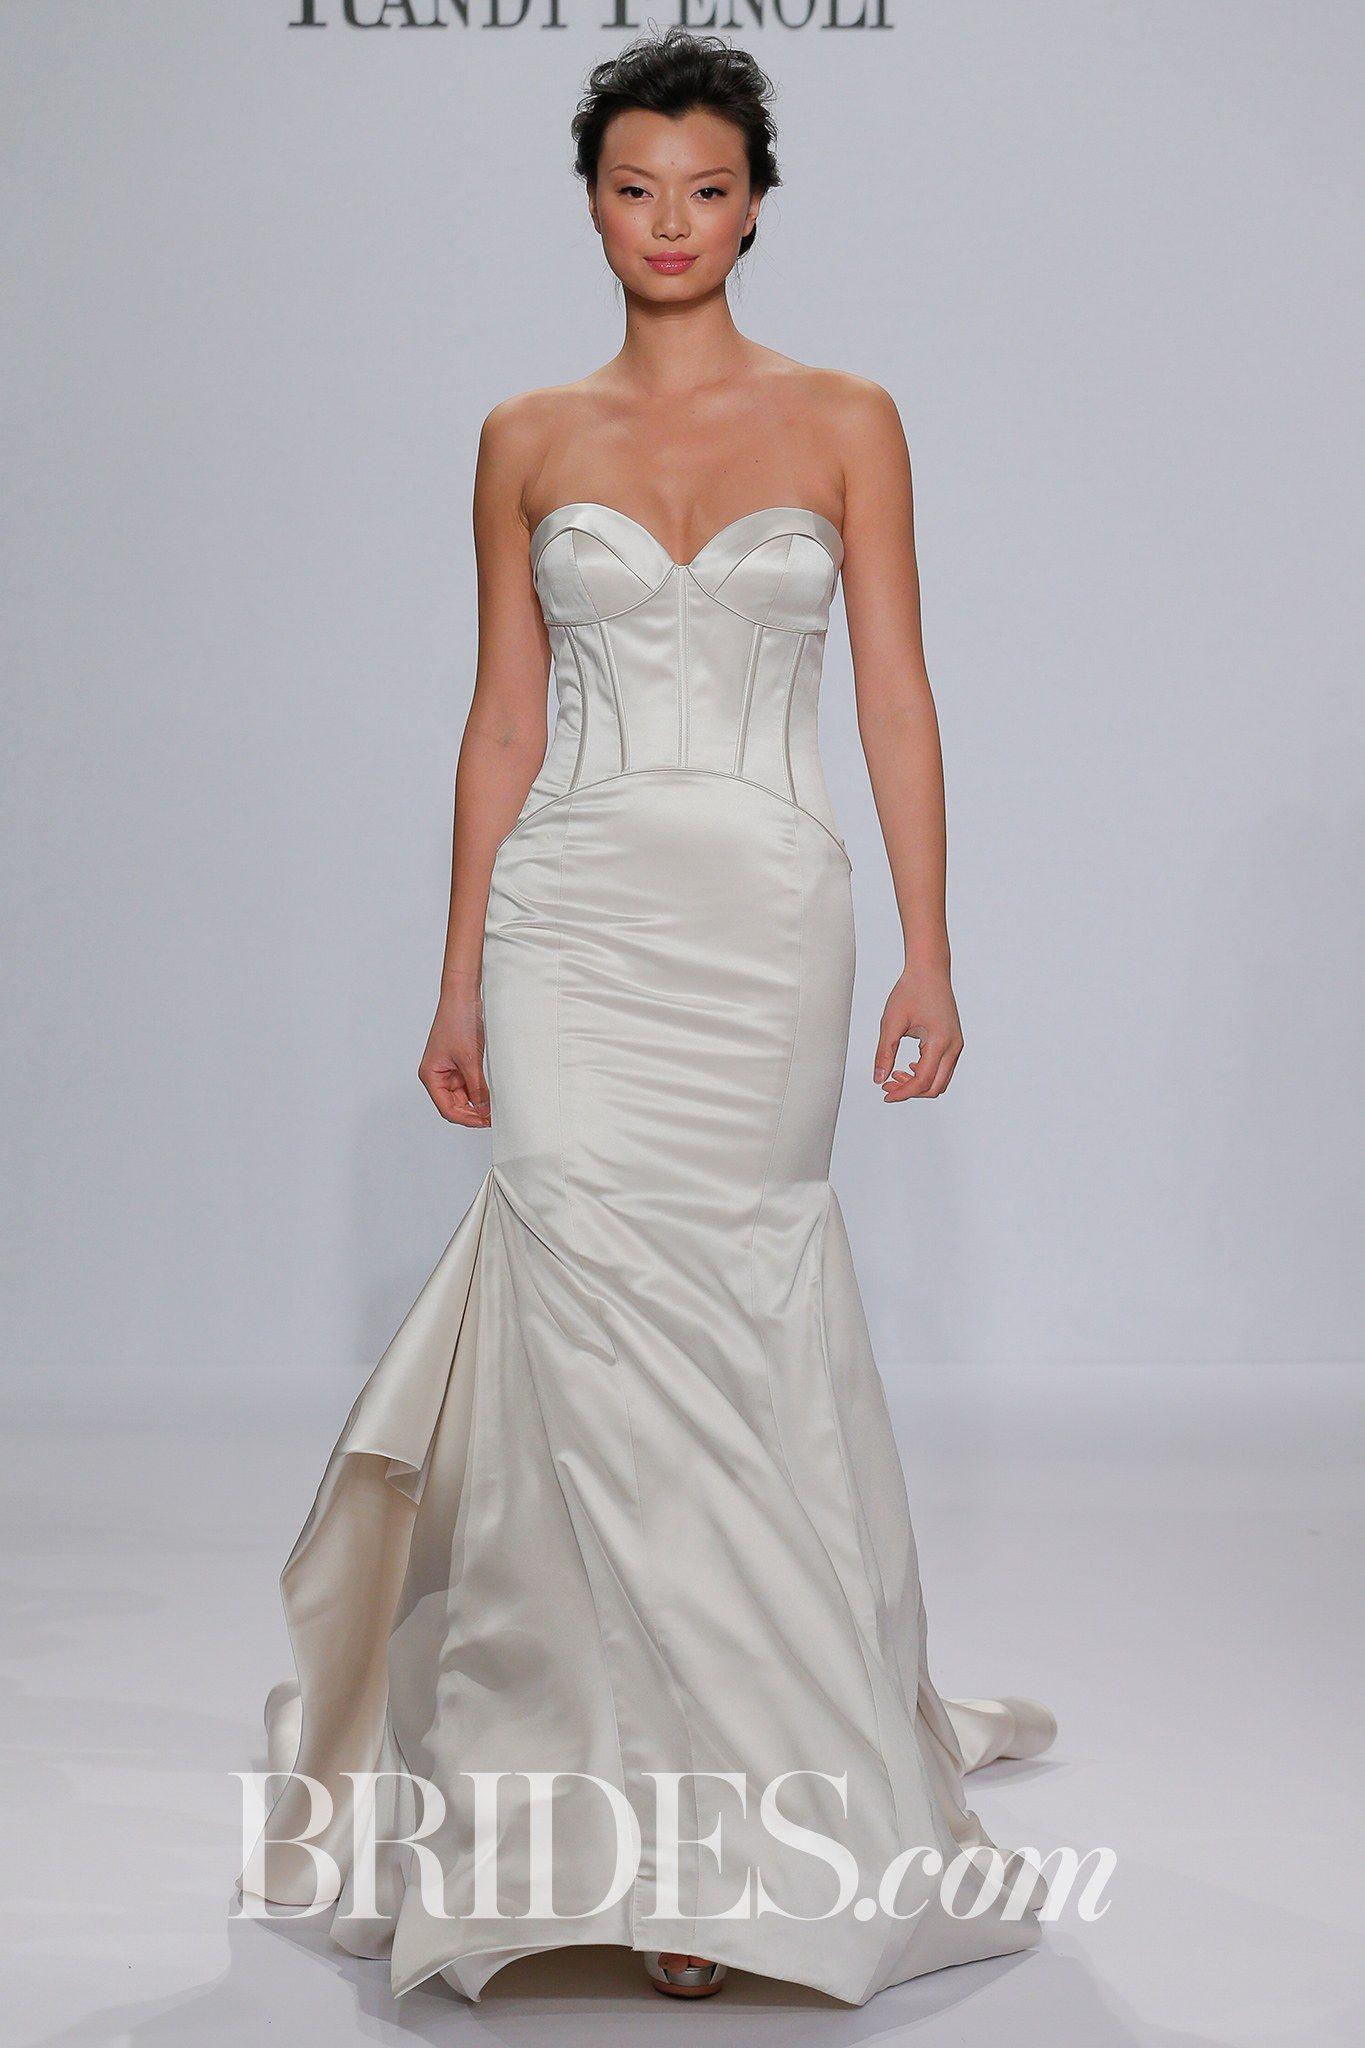 Buy Dresses wedding kleinfeld picture trends